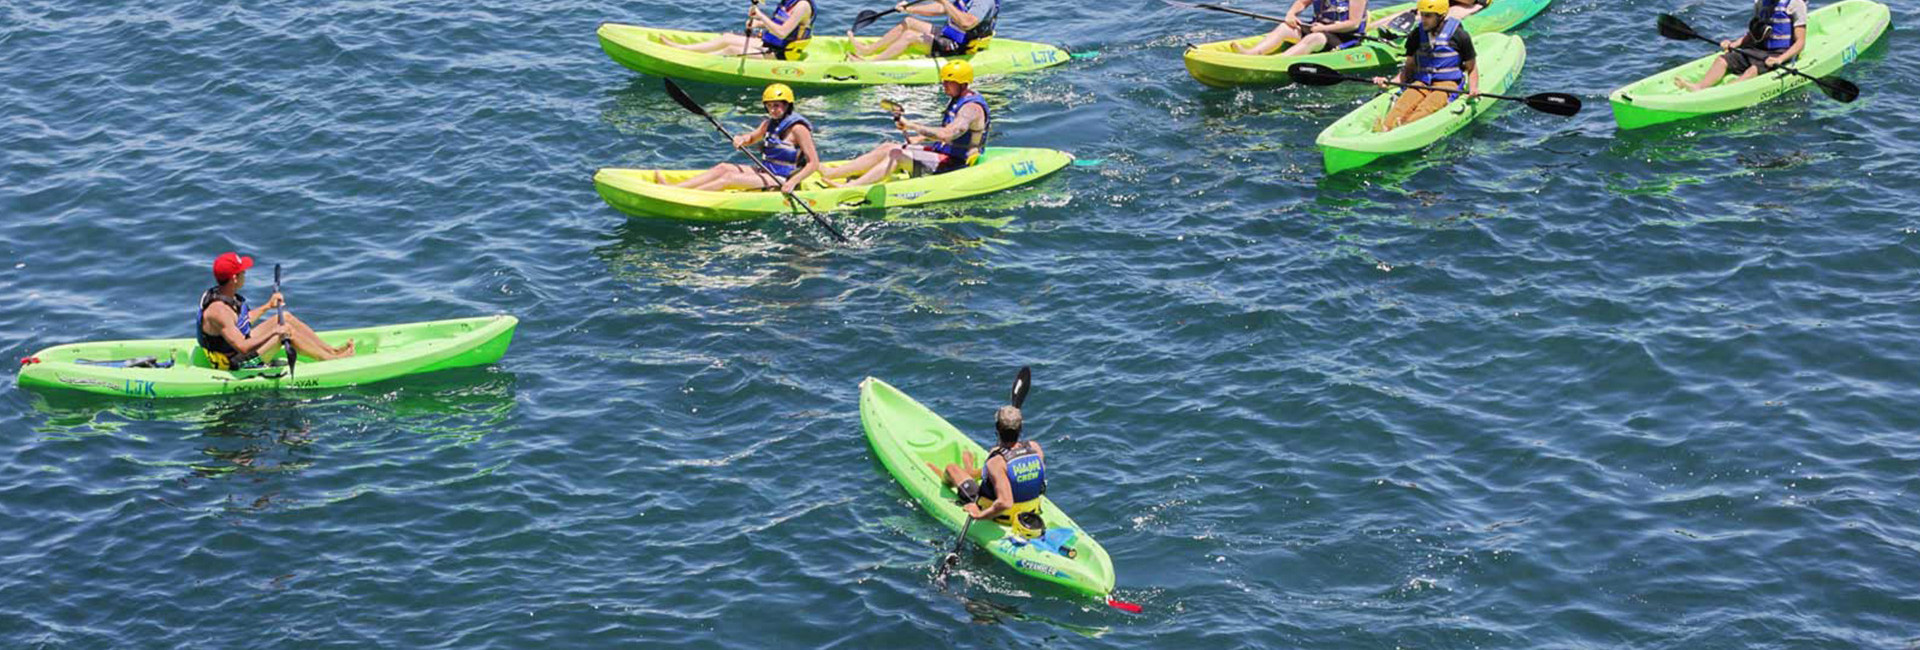 Group in green kayaks